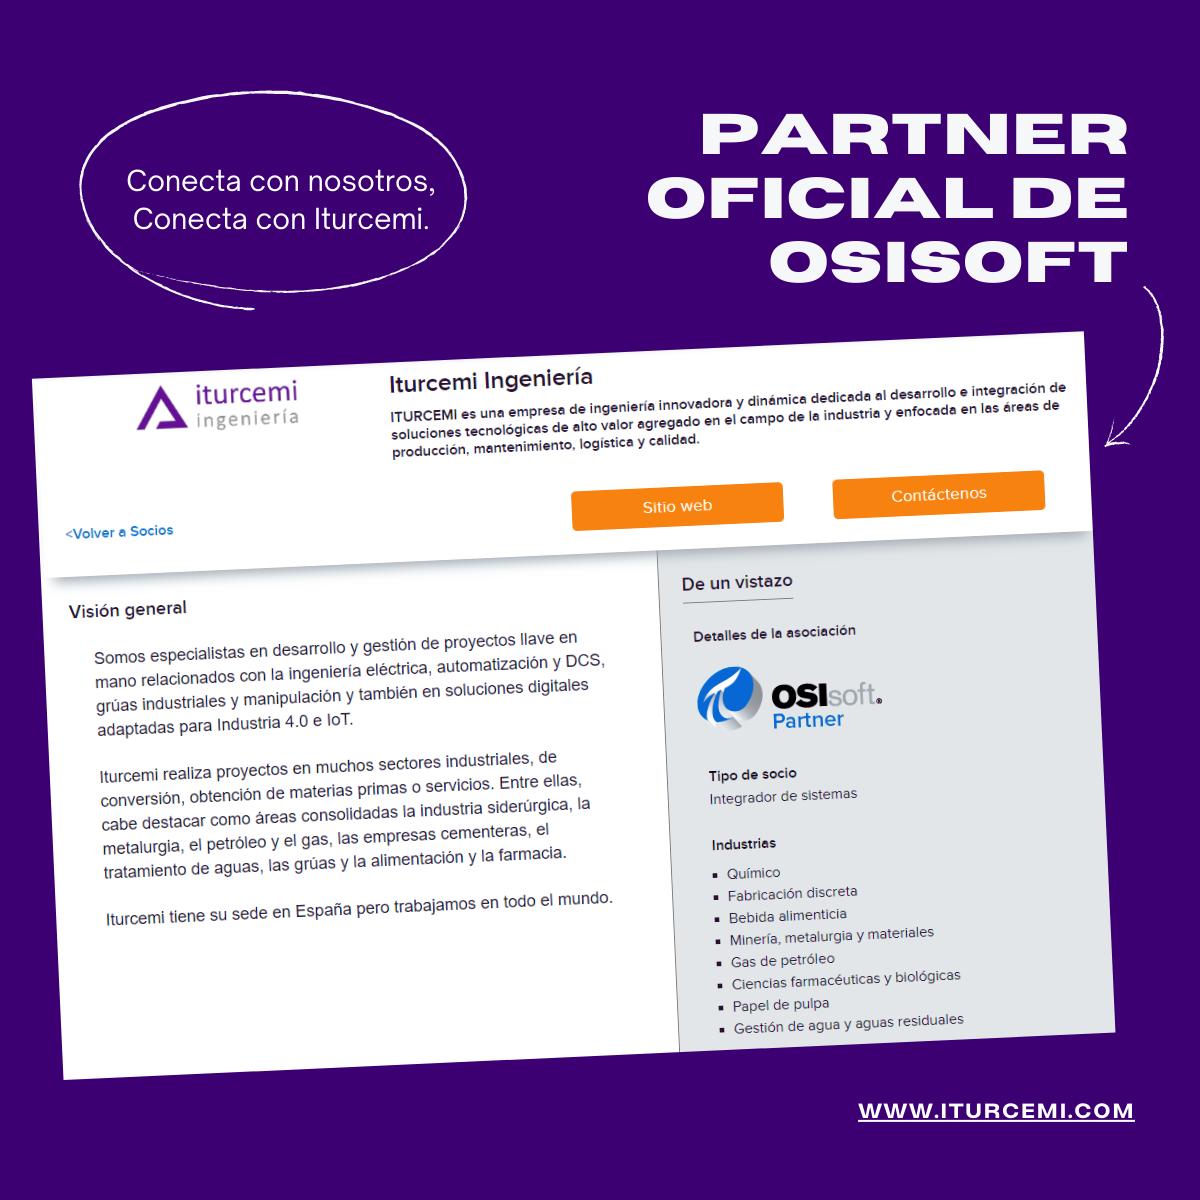 Osisoft Official Partner